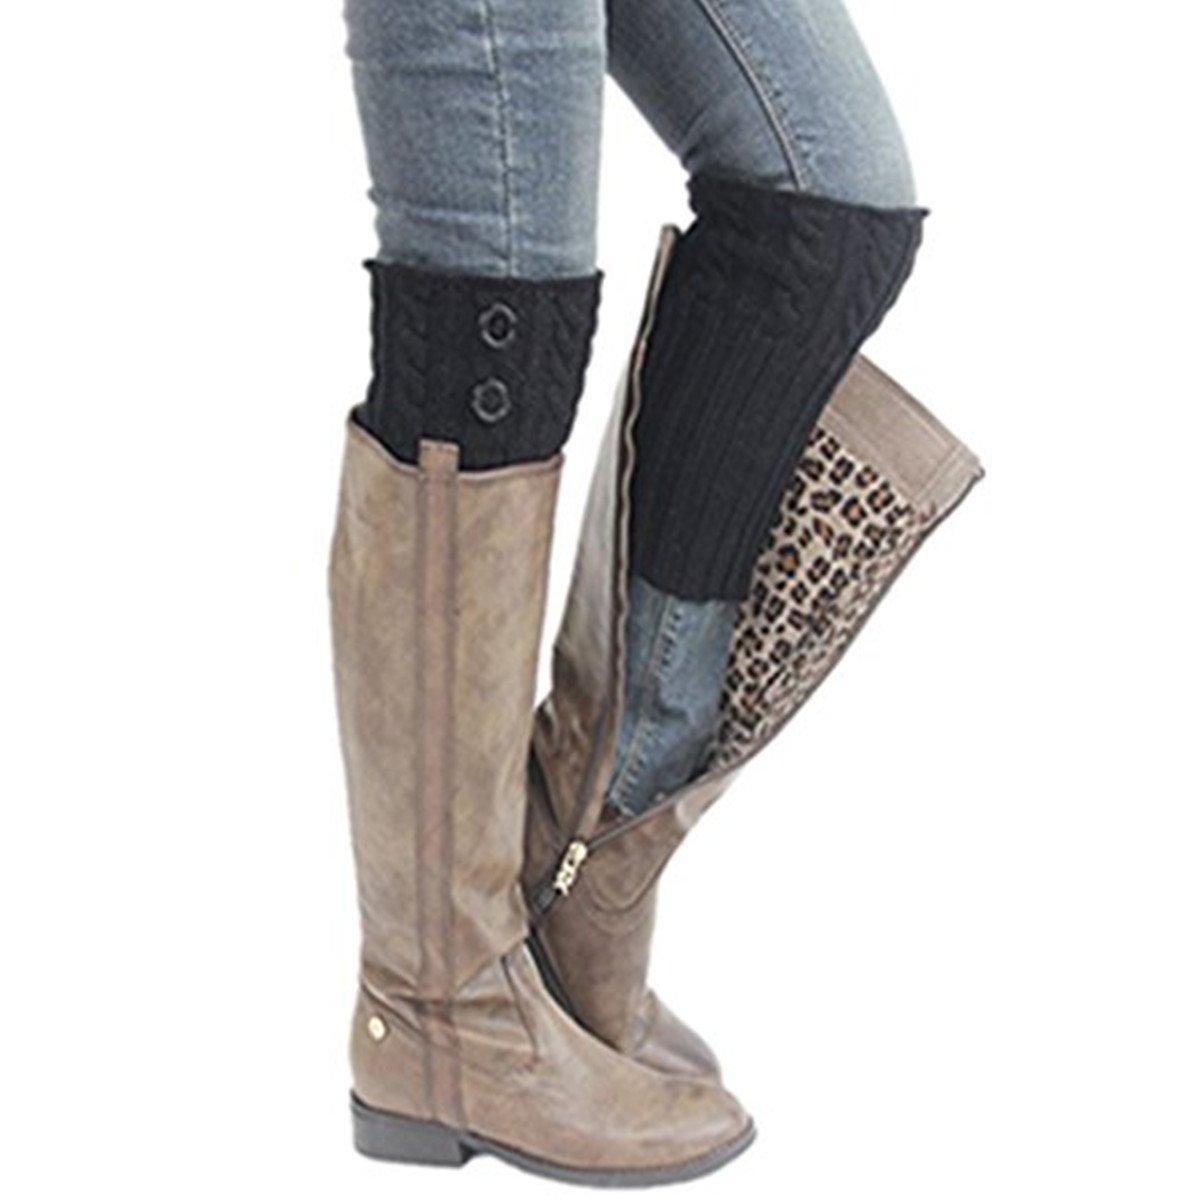 Clearance! E-Papaya 2016 Women's Buttons Leg Warmer Knit Boot Socks Topper Cuff (Black)